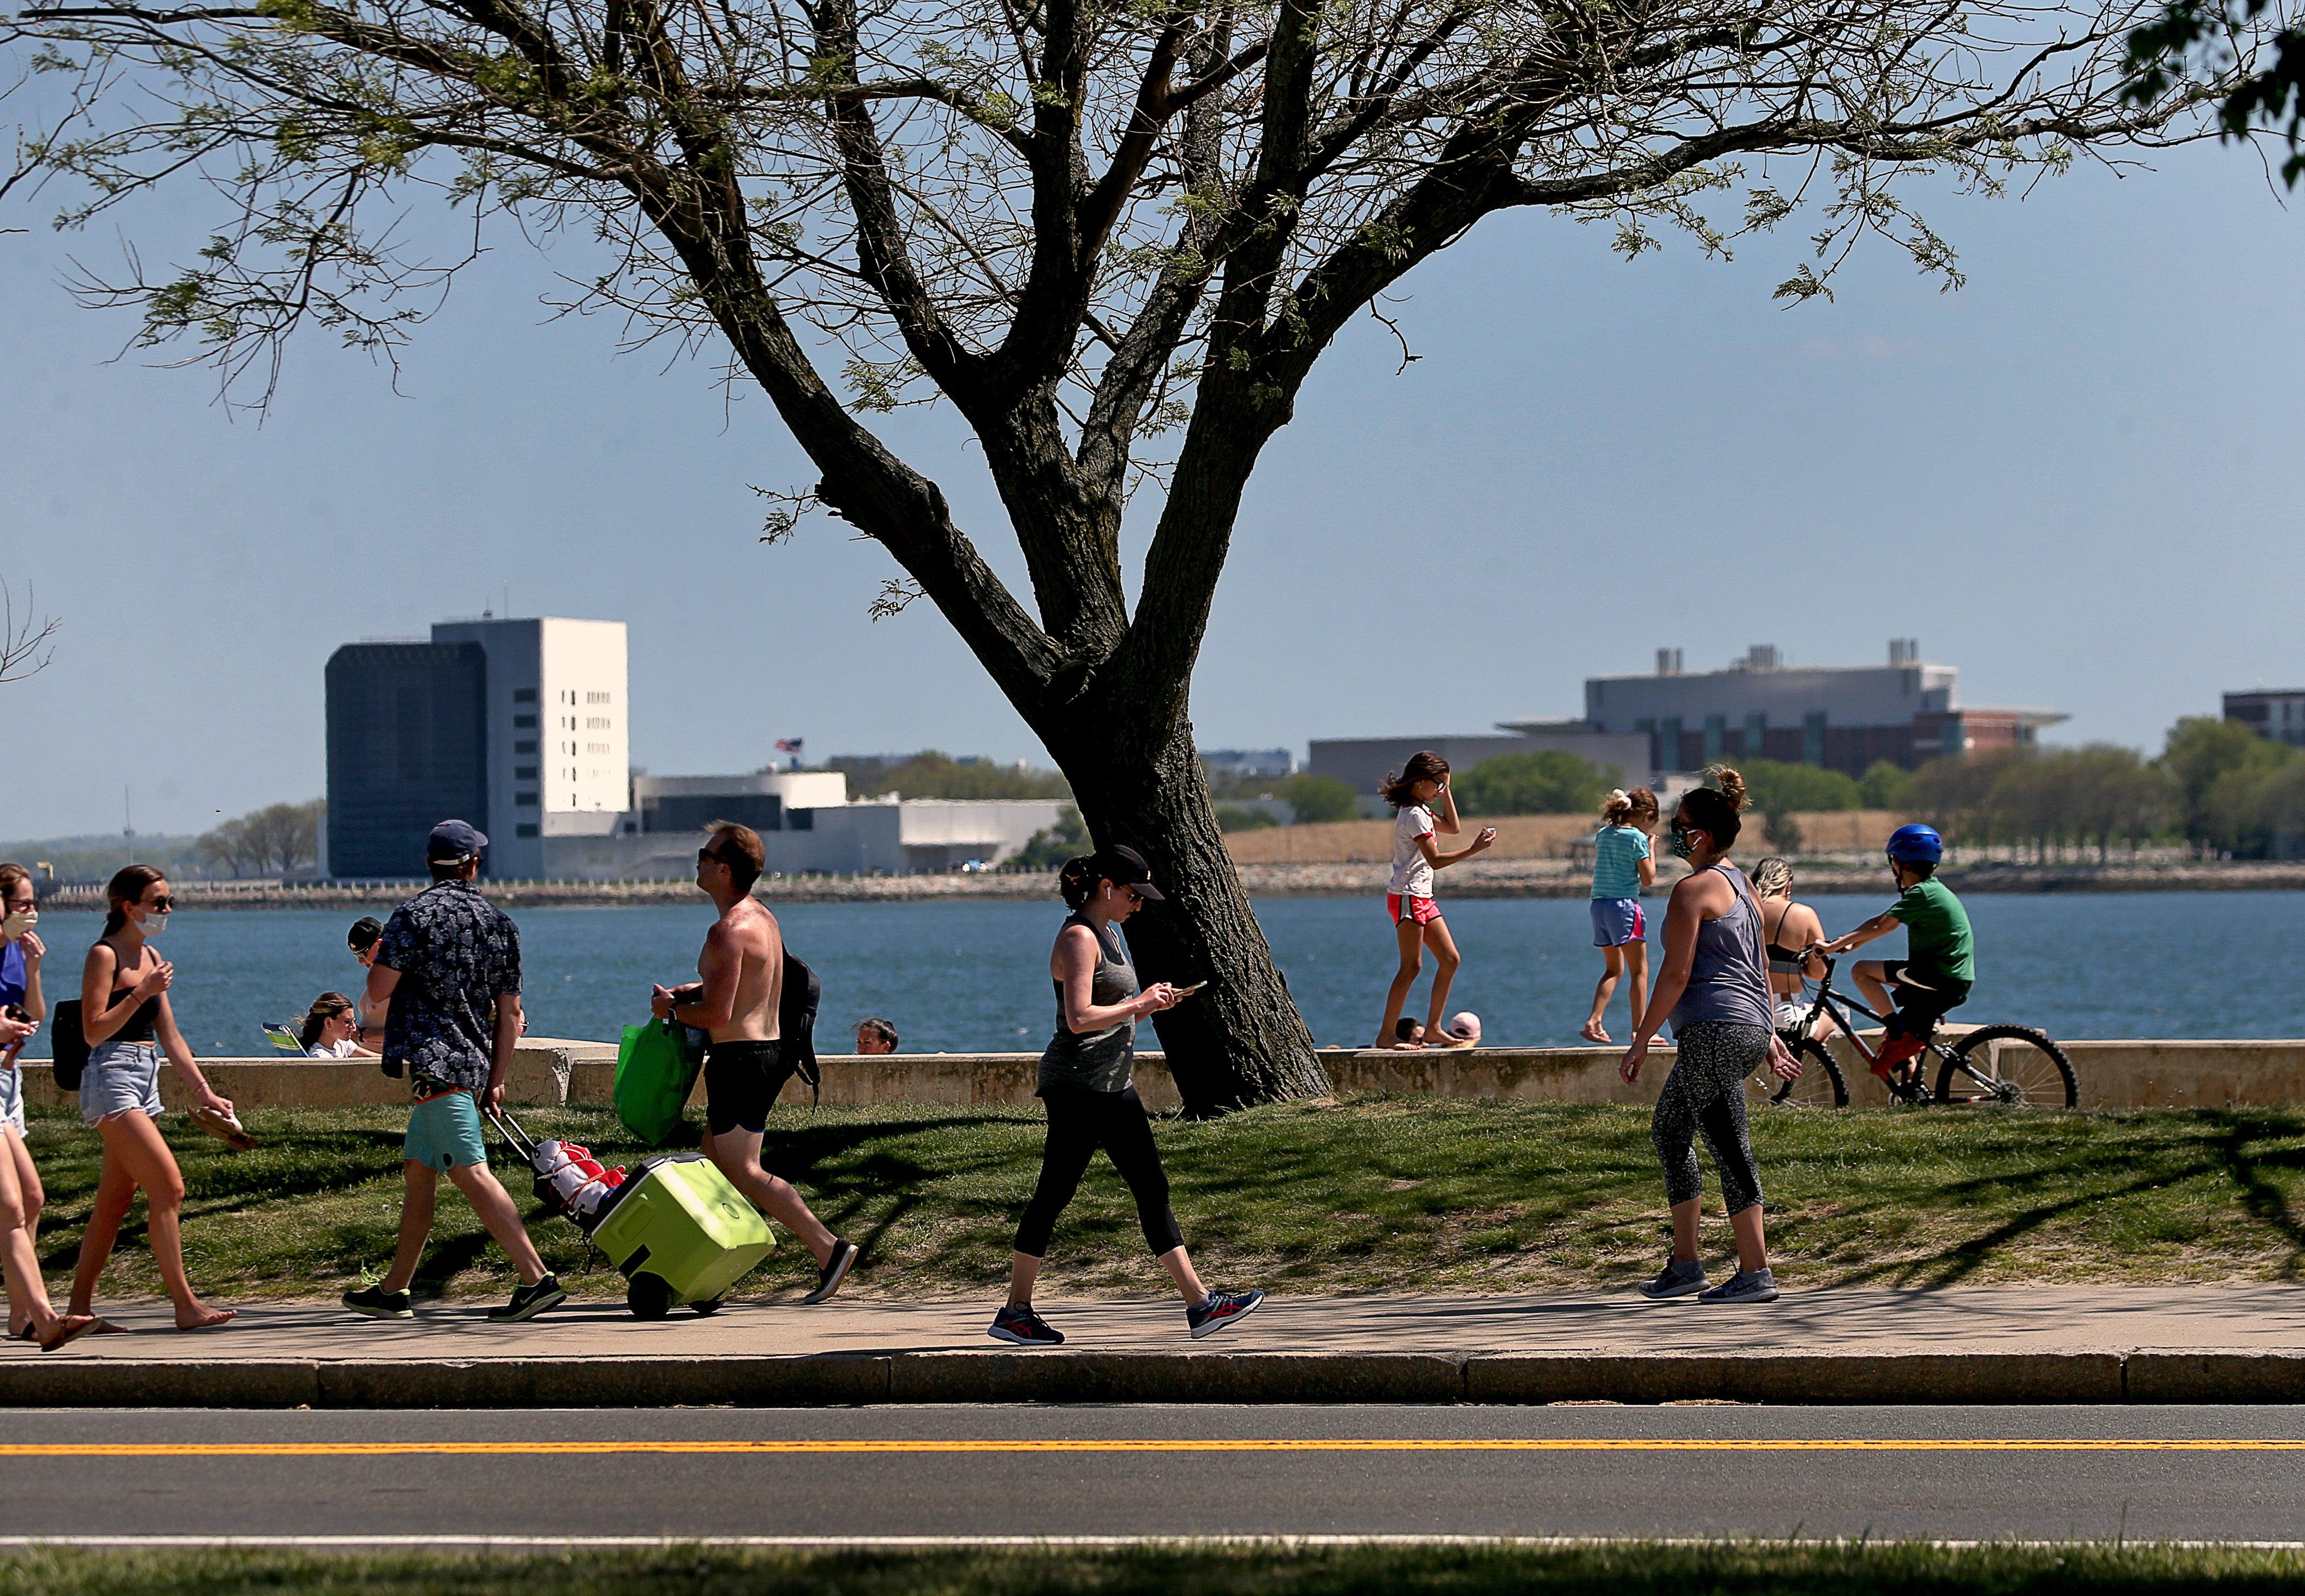 Beachgoers at South Boston's beaches.